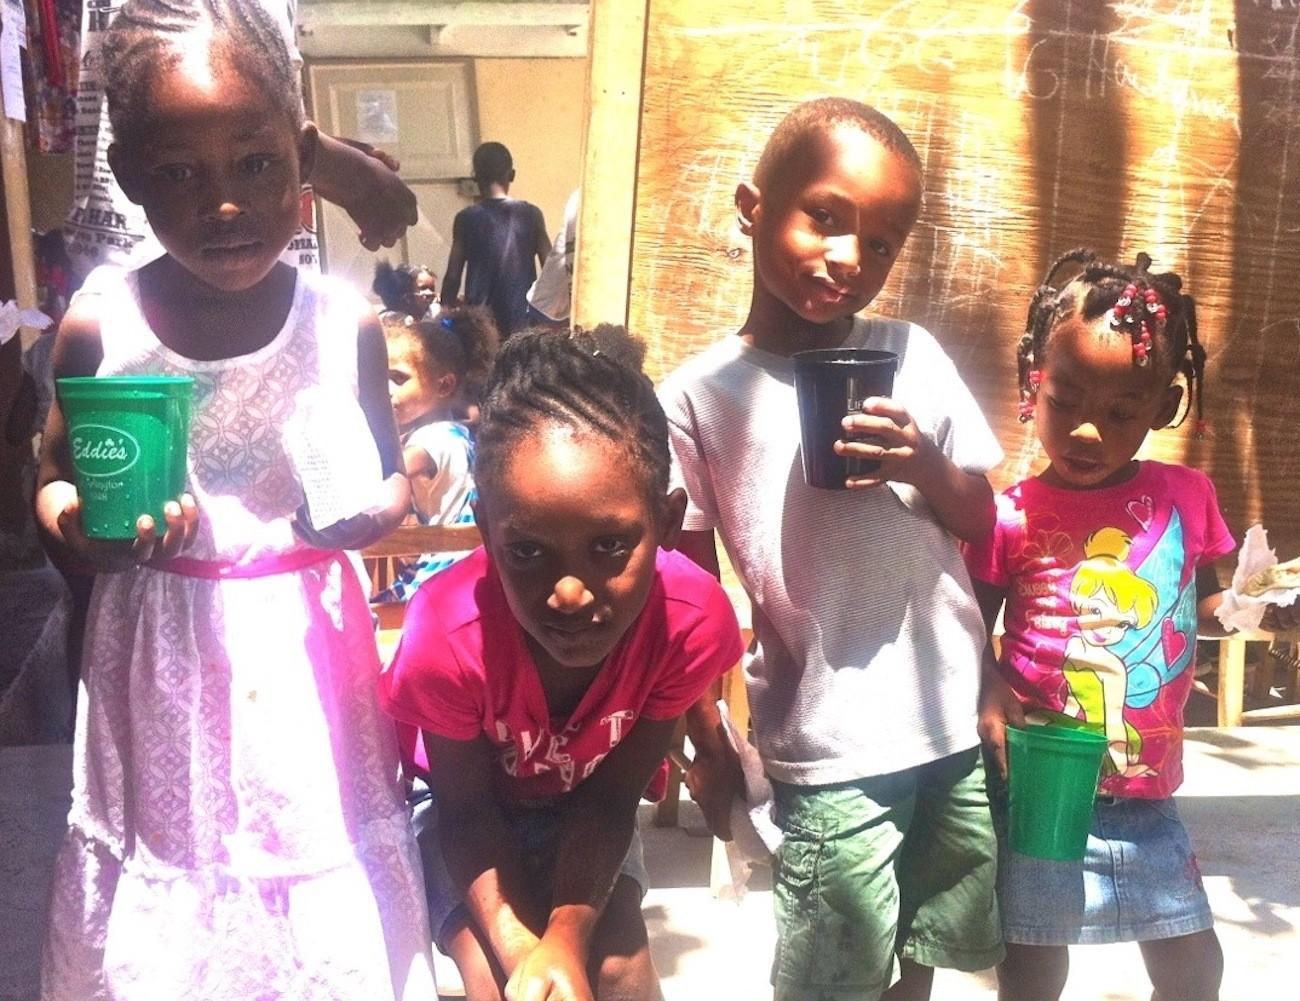 Haiti Projects Handmade Goods